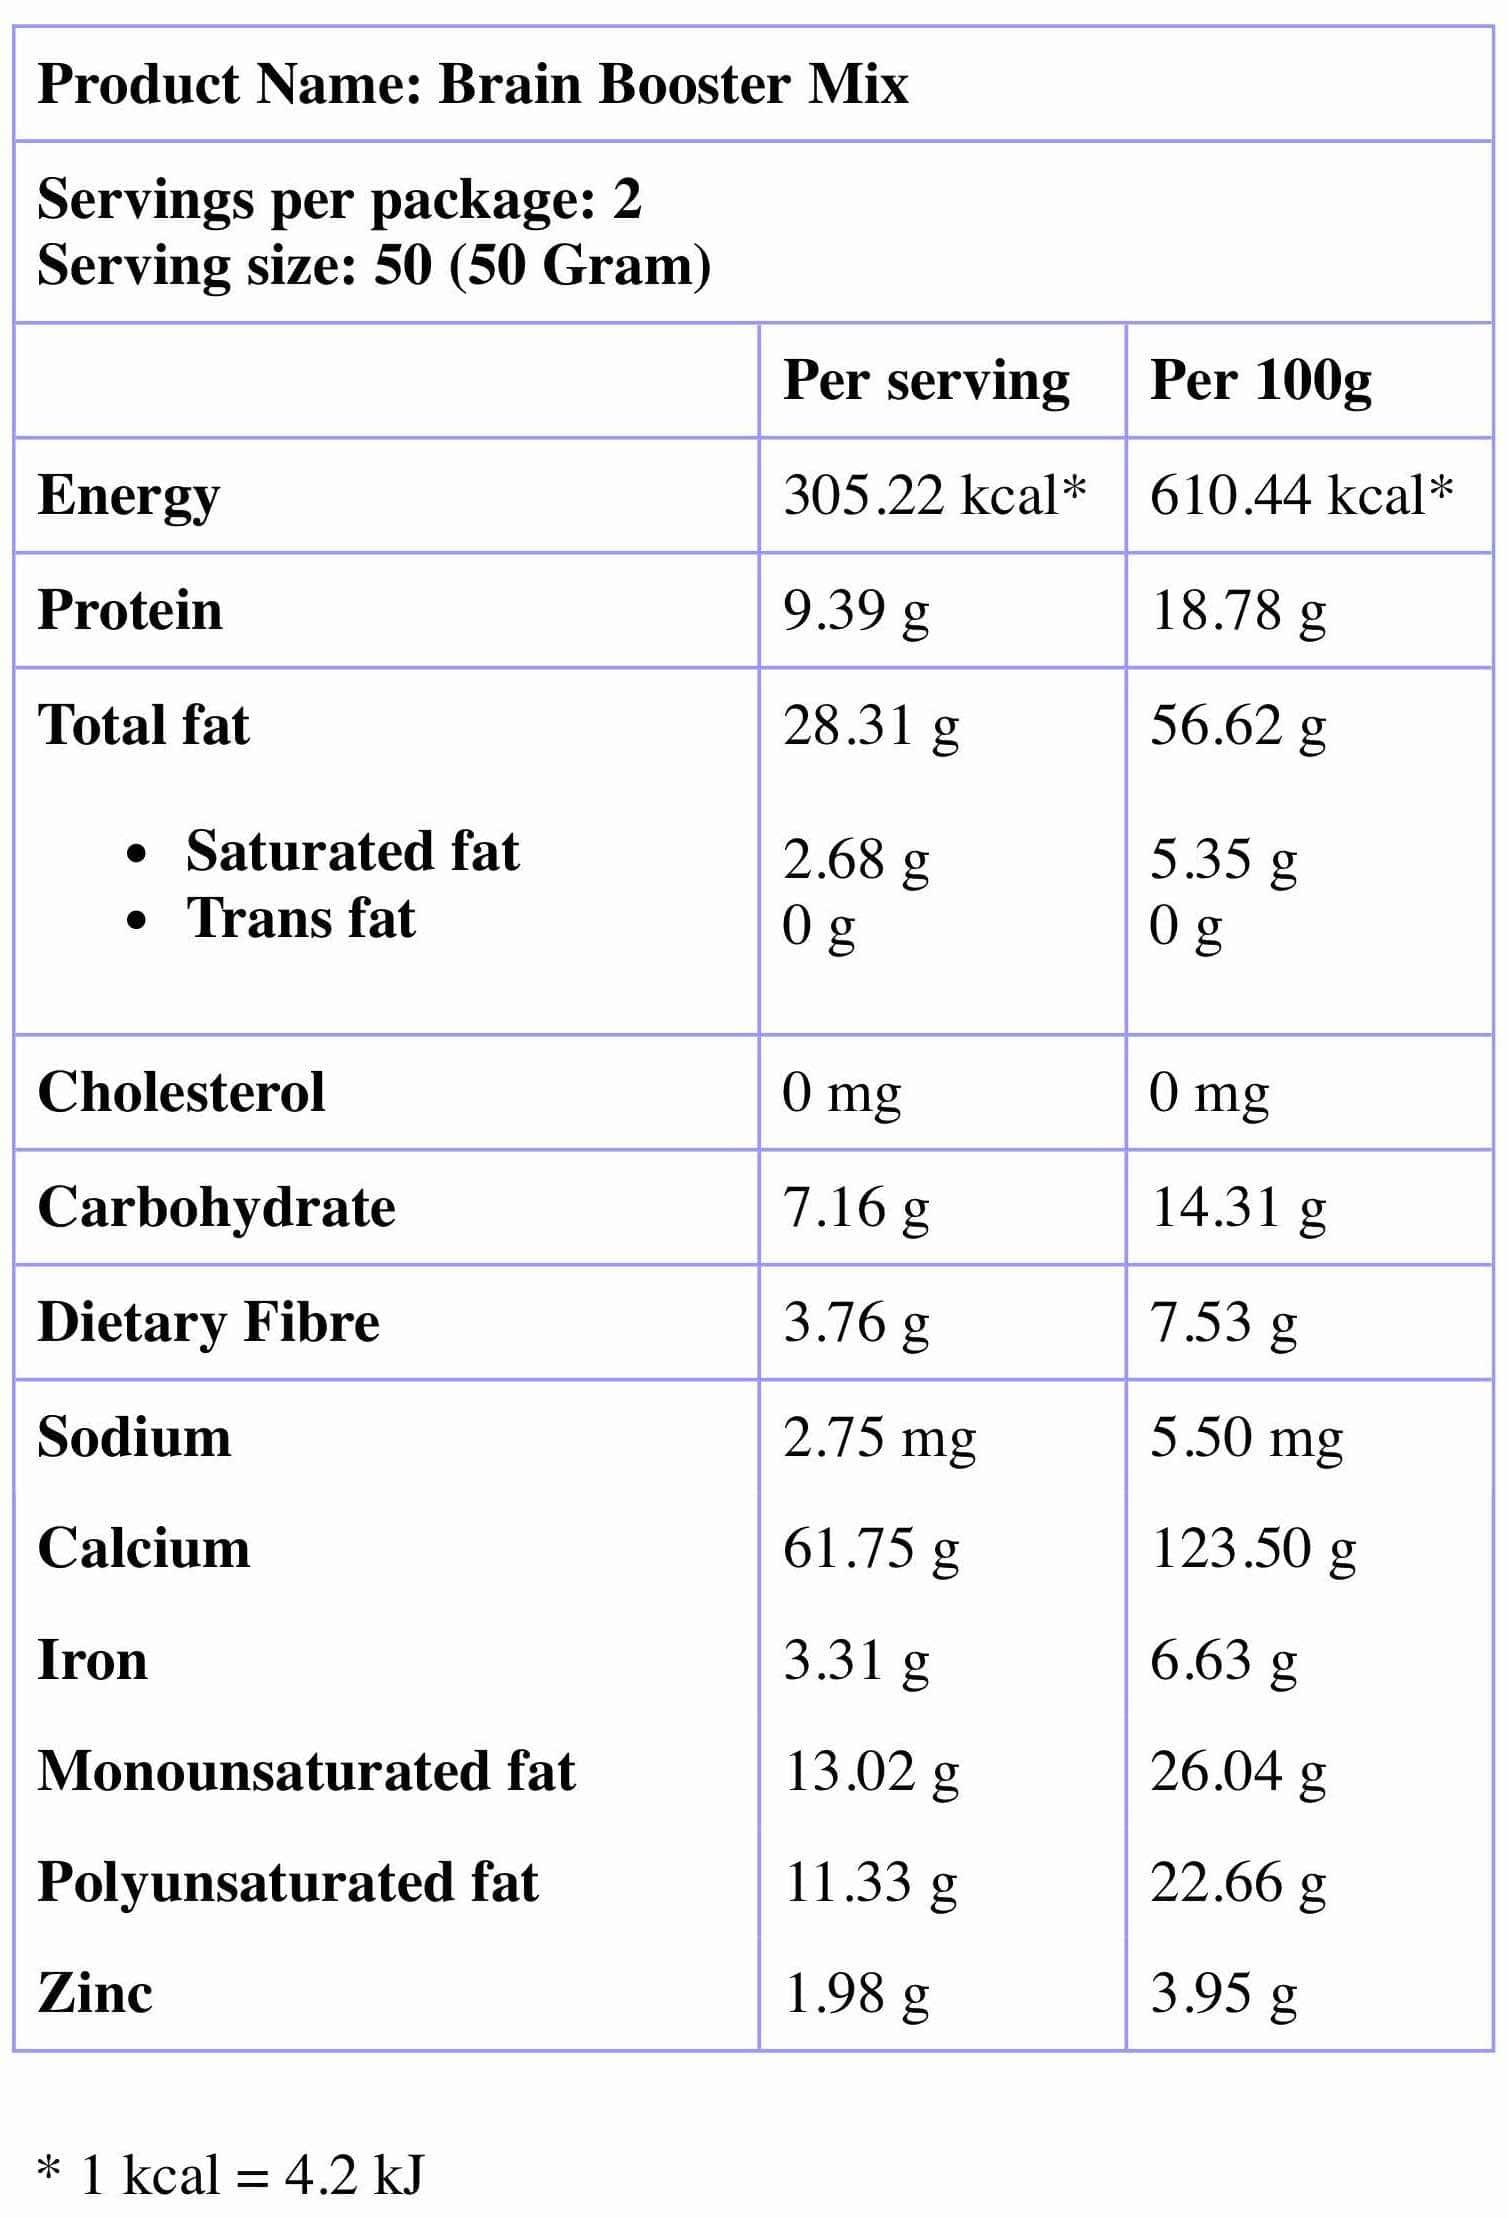 Brain Booster Mix Nutrition Information